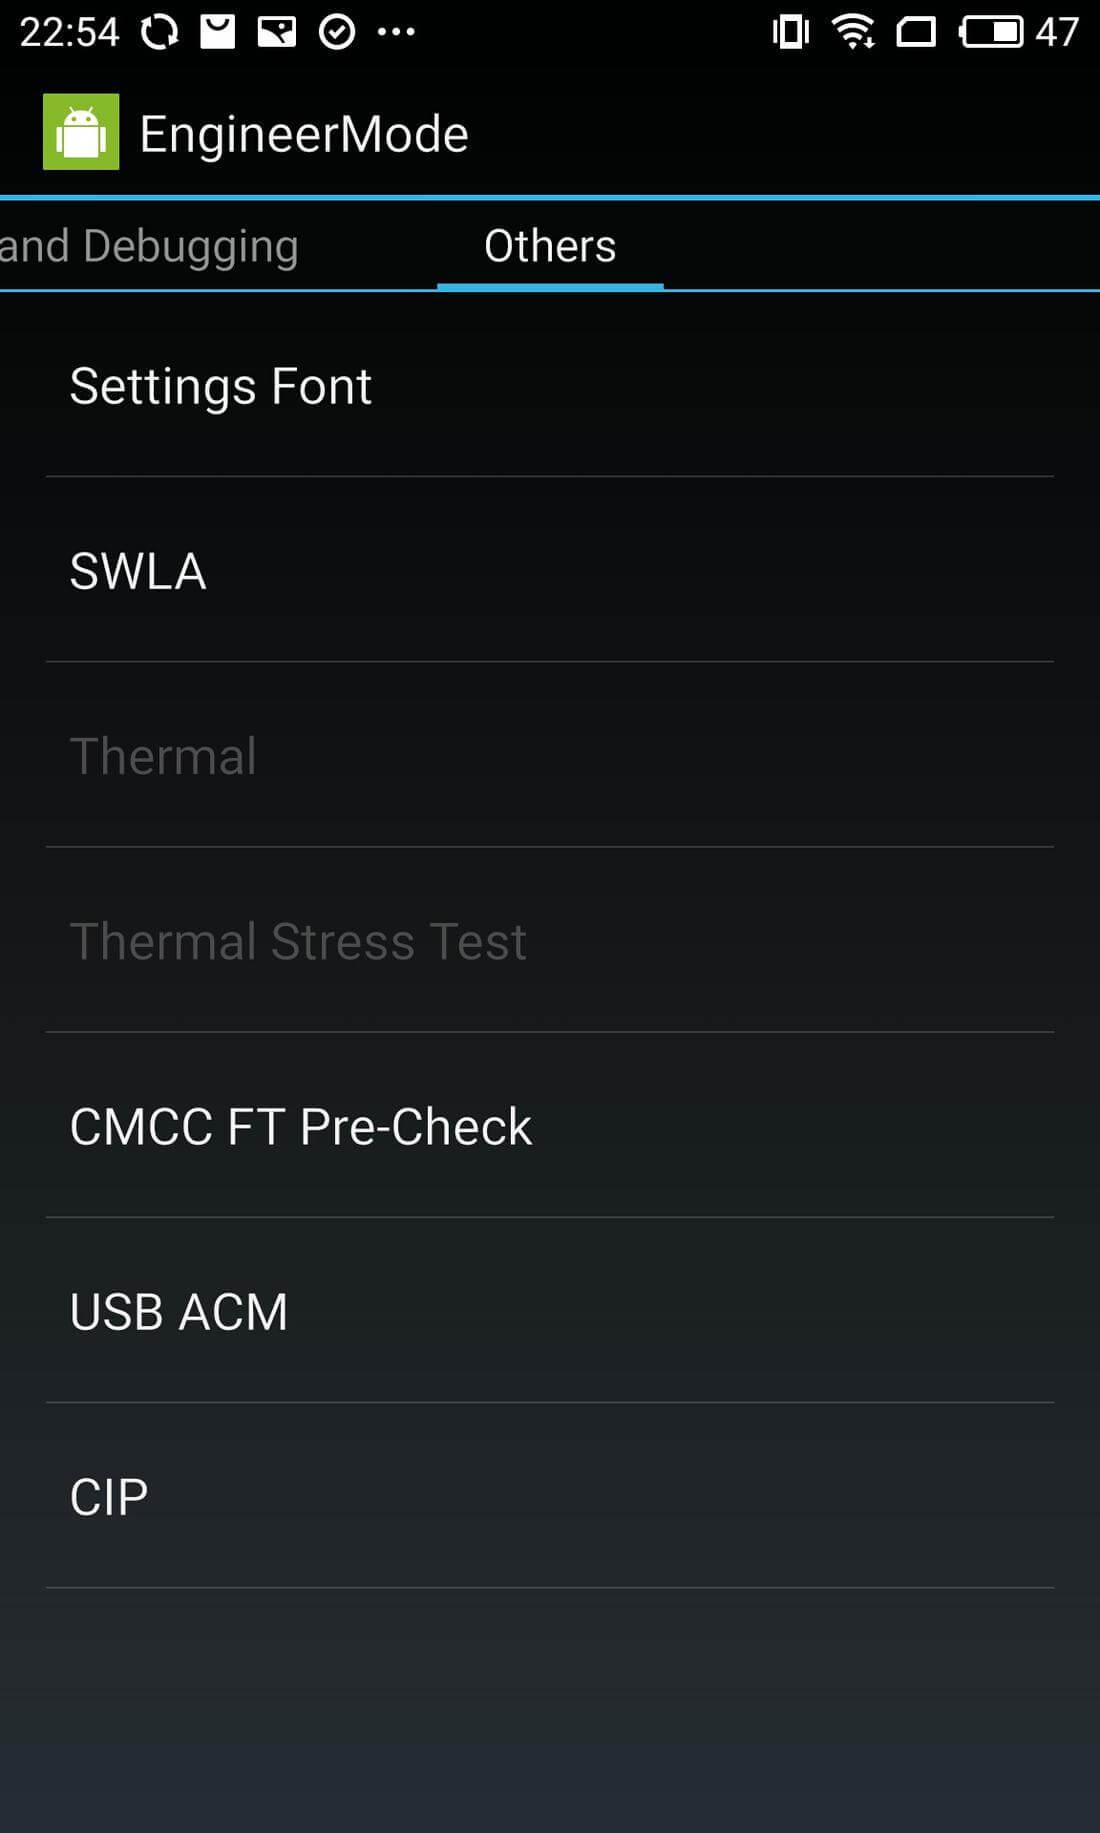 Скриншот #10 из программы MTK Engineering Mode